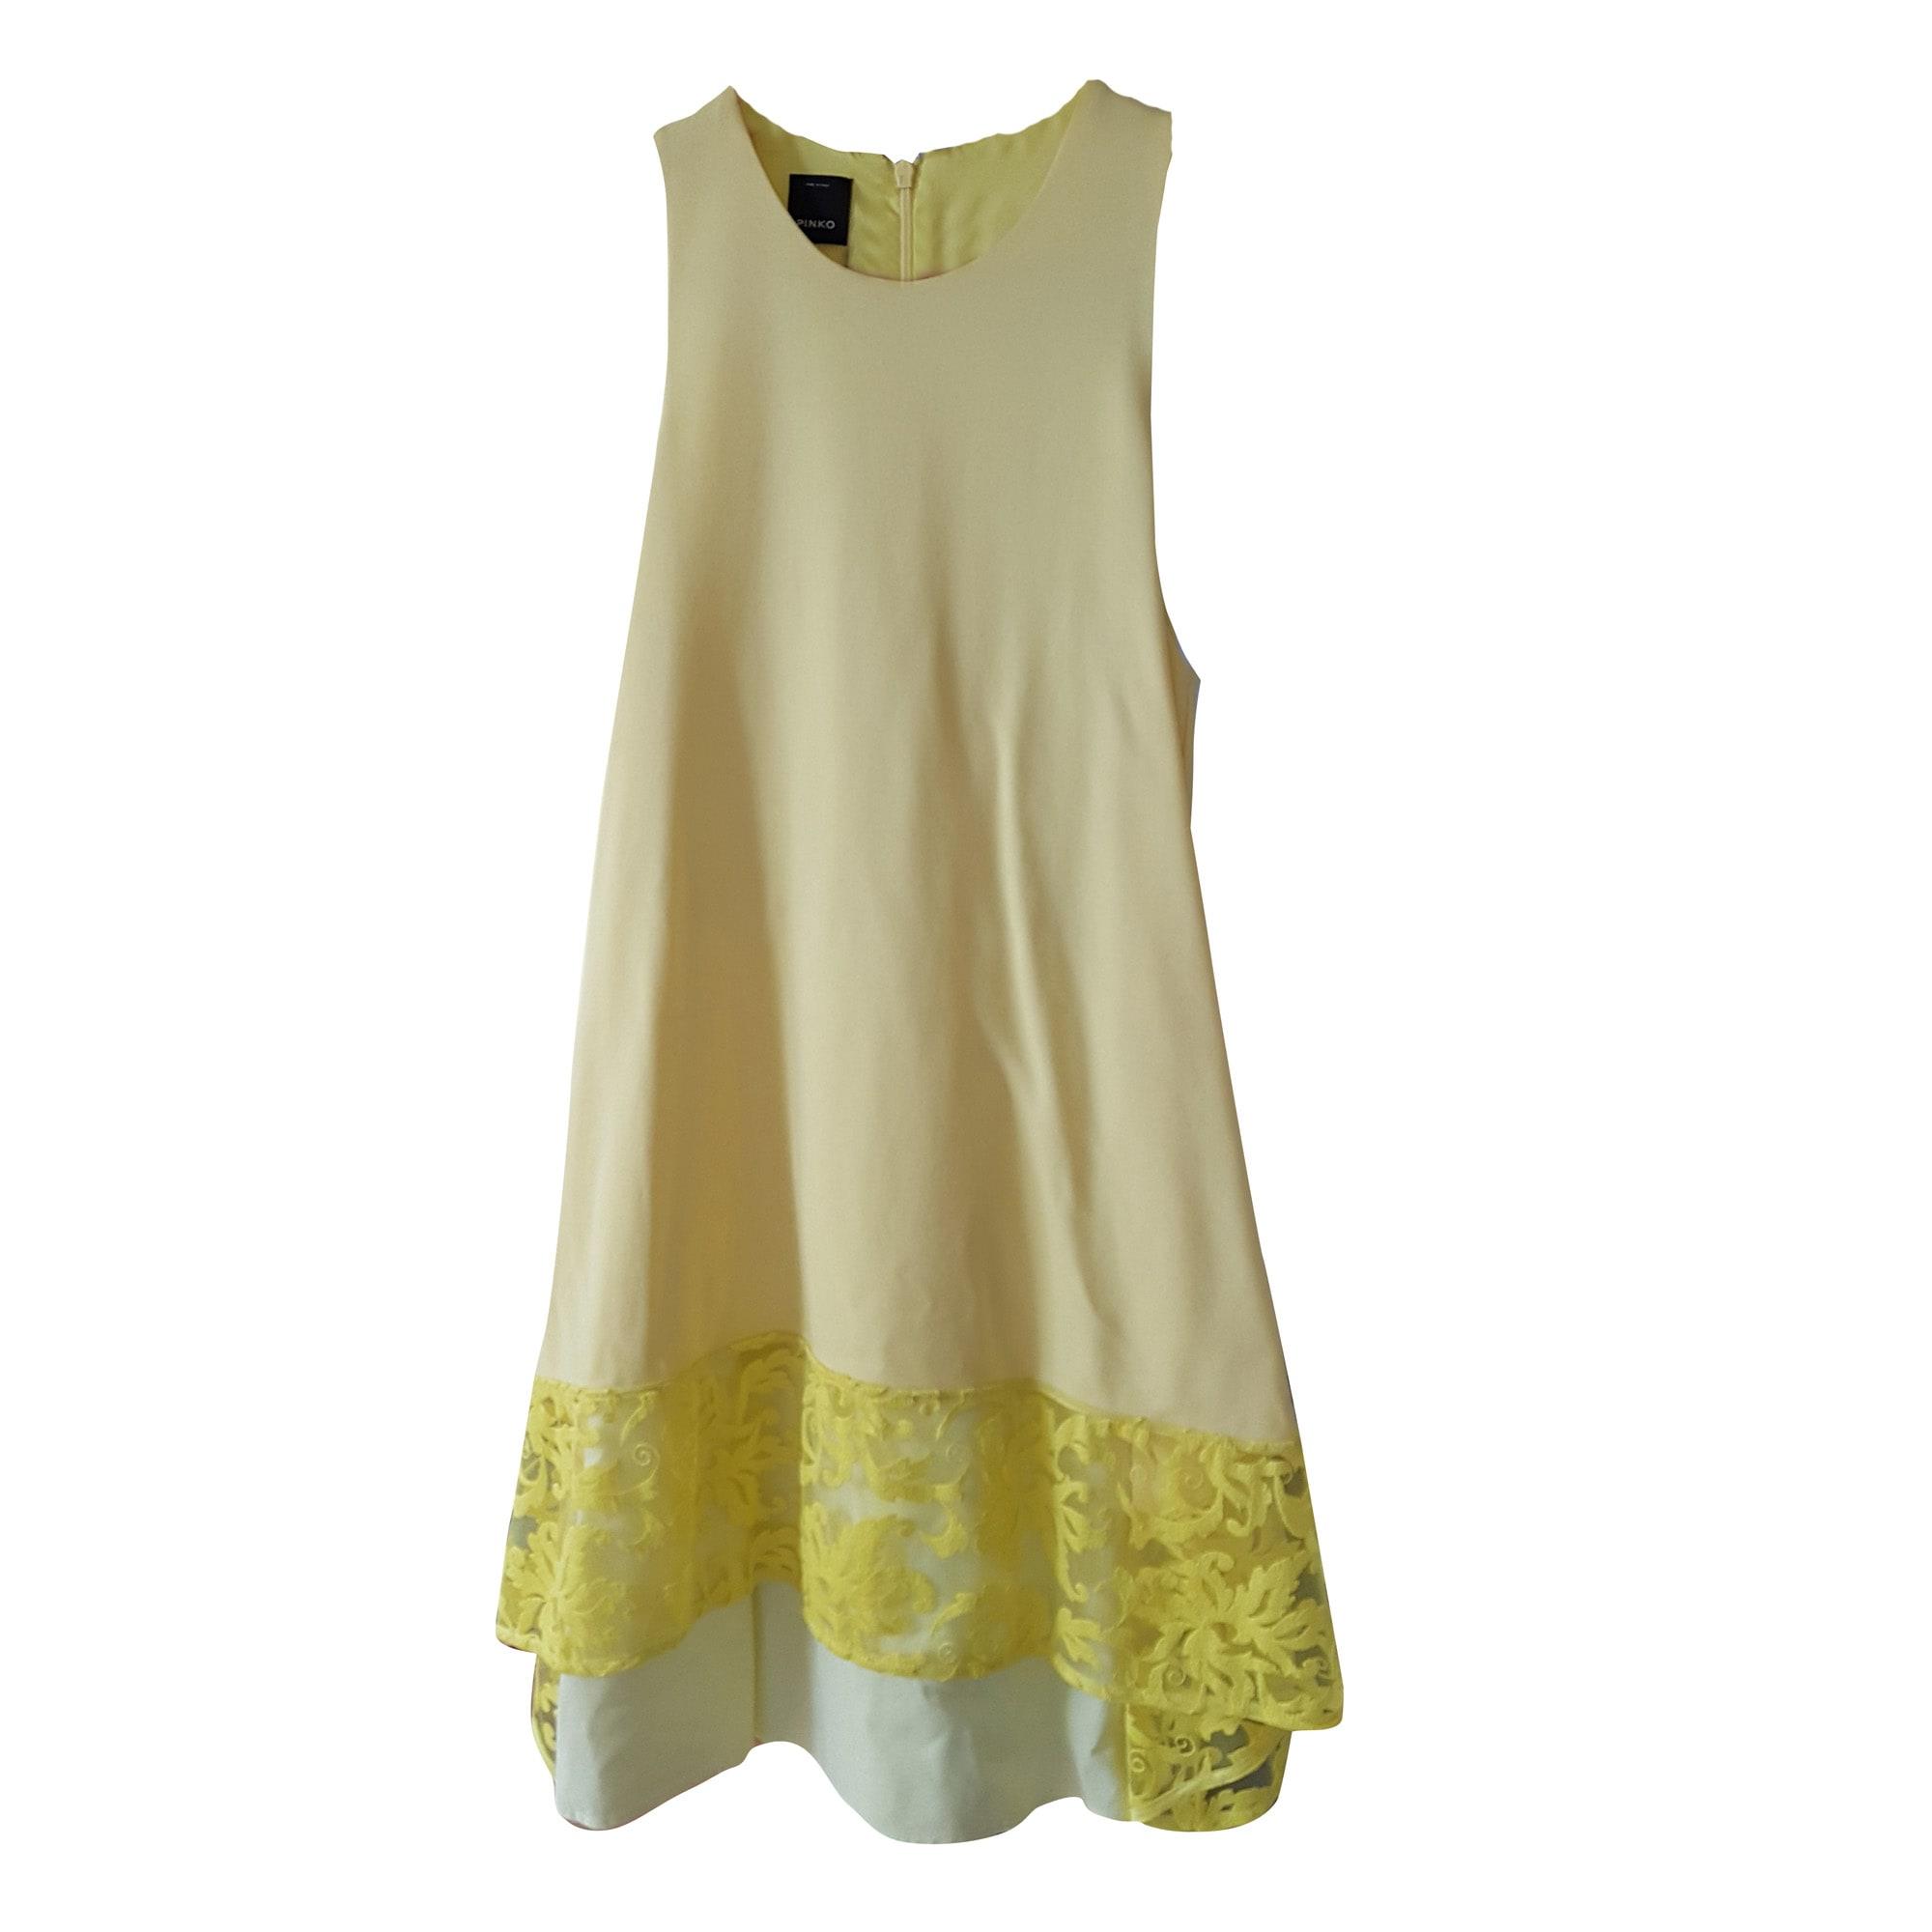 Robe courte PINKO 36 (S, T1) jaune - 7697808 5280787c4a8f